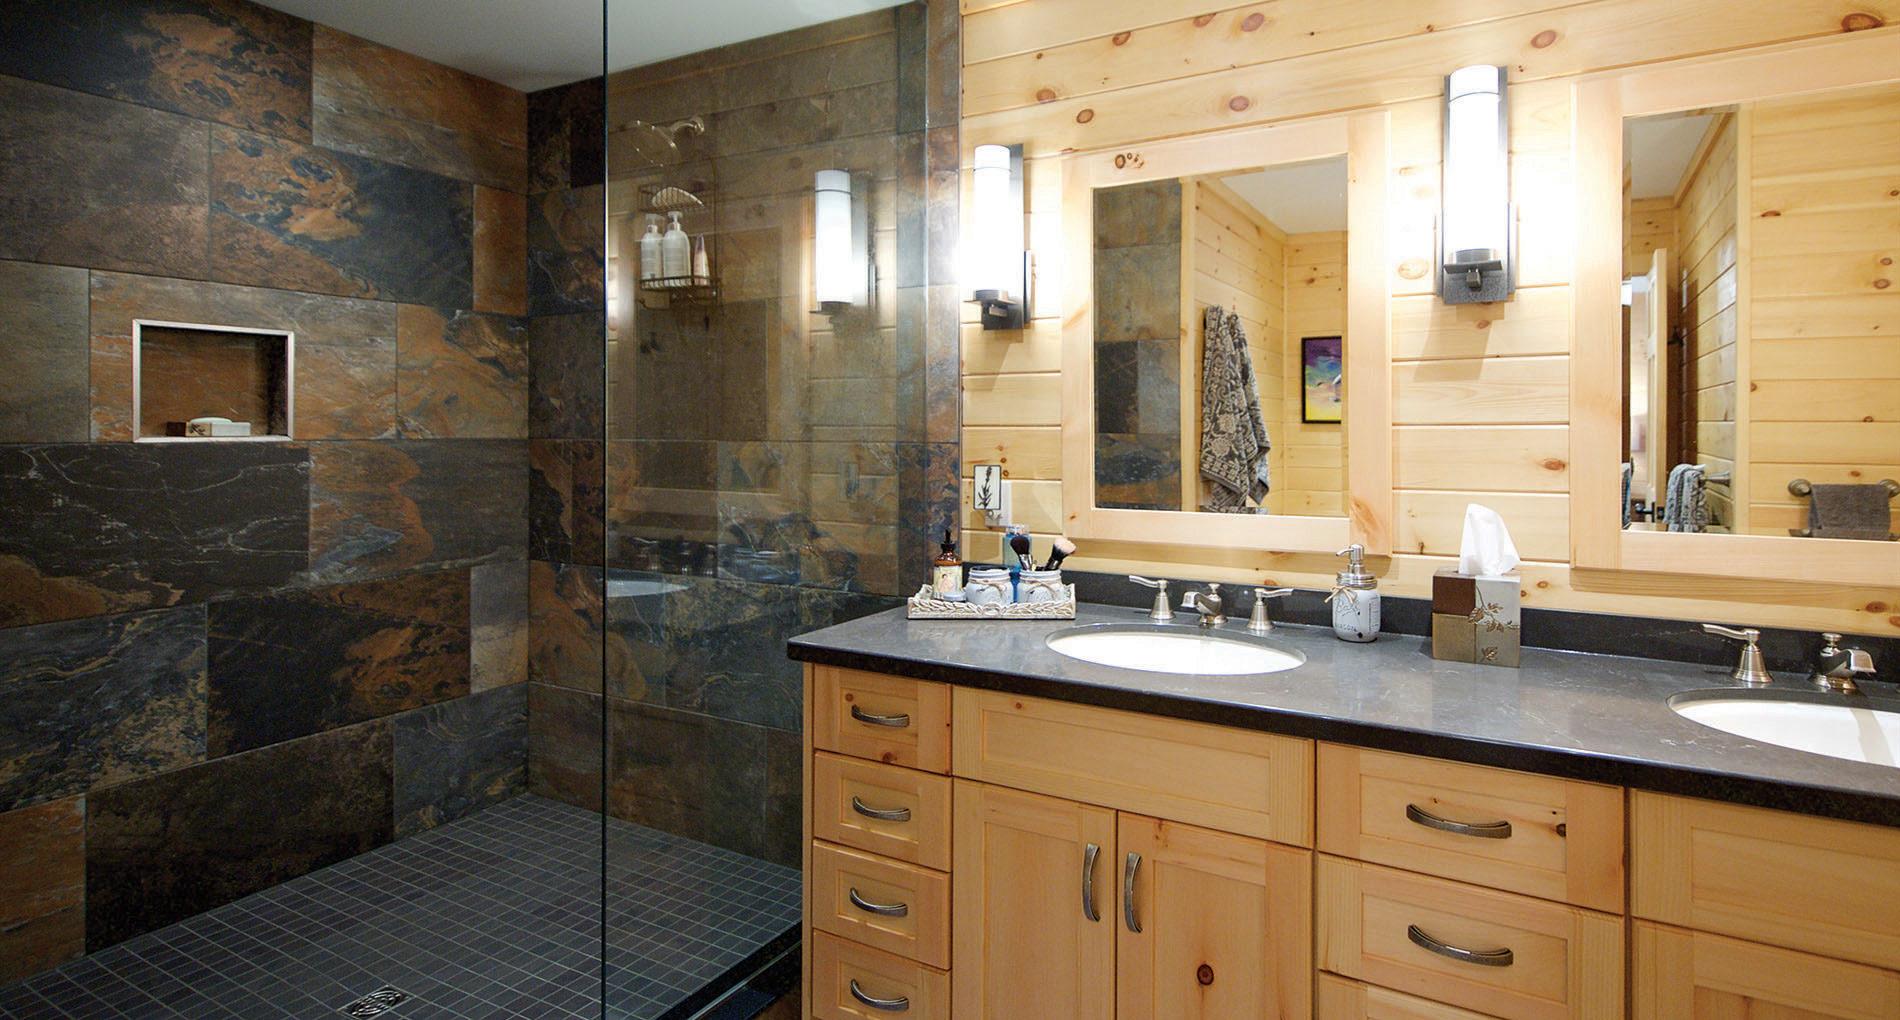 bradford-bathroom-renovation